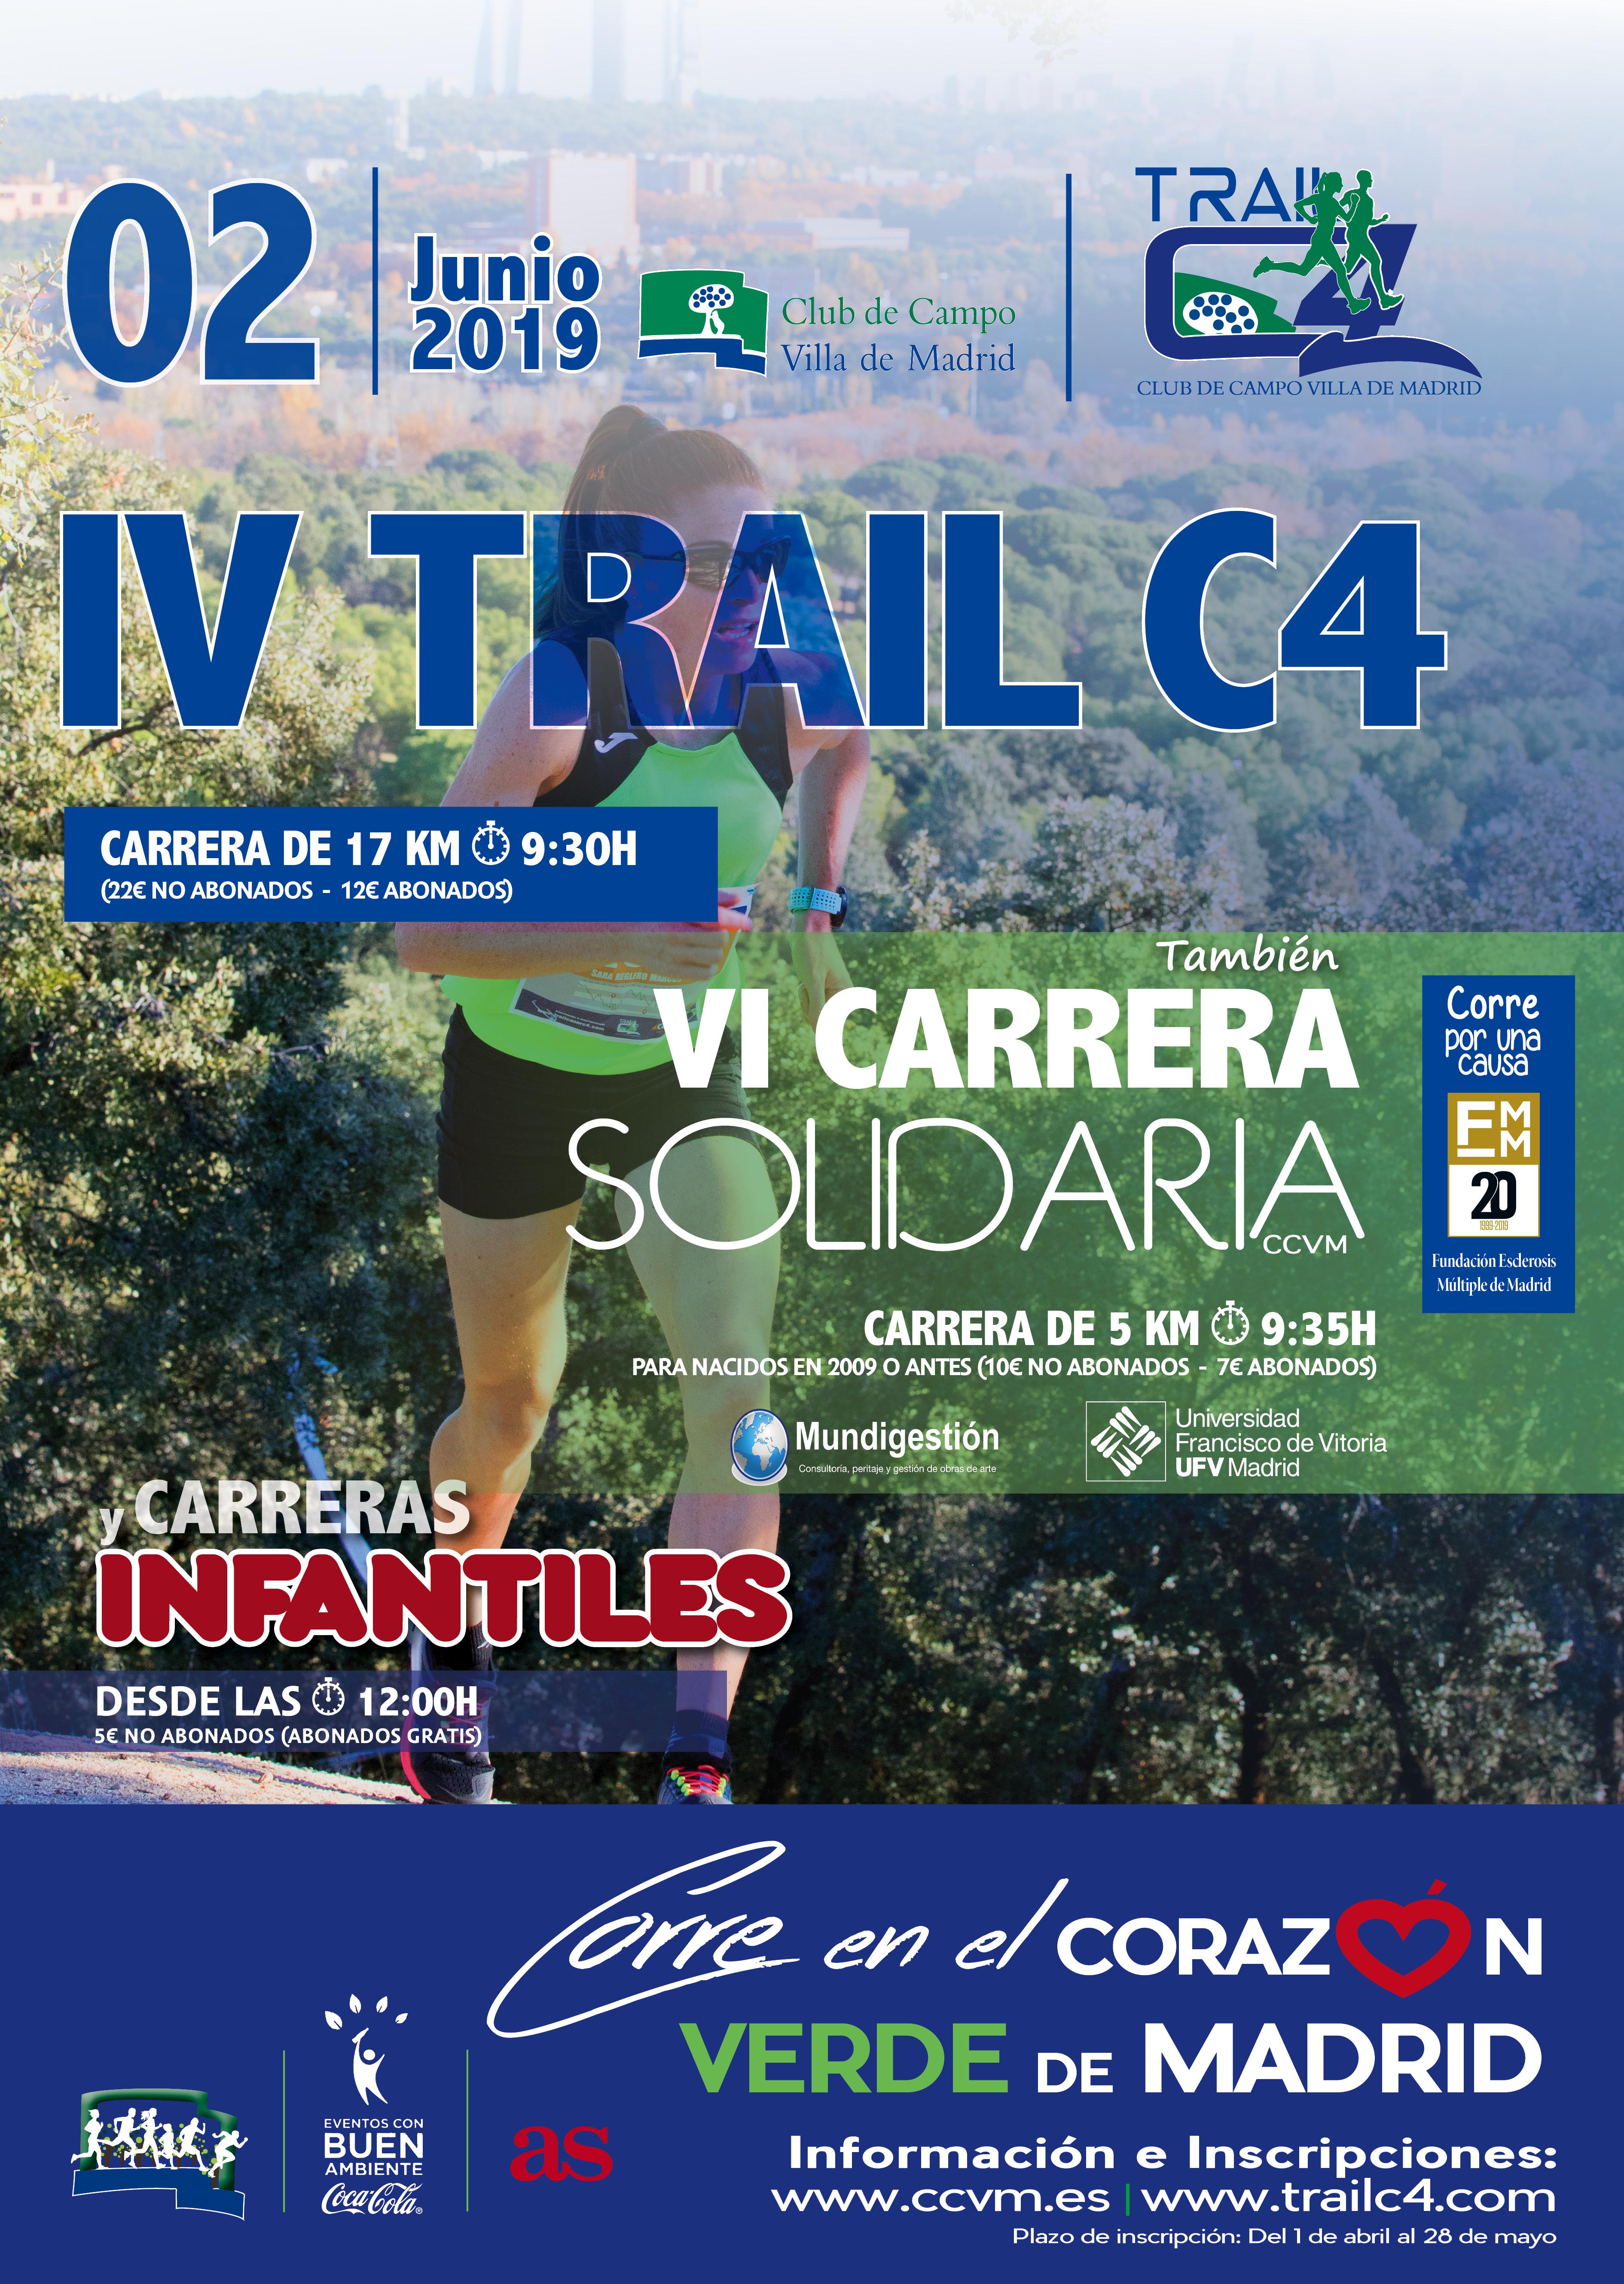 IV Trail C4 2019 y VI Carrera Solidaria CCVM 2019